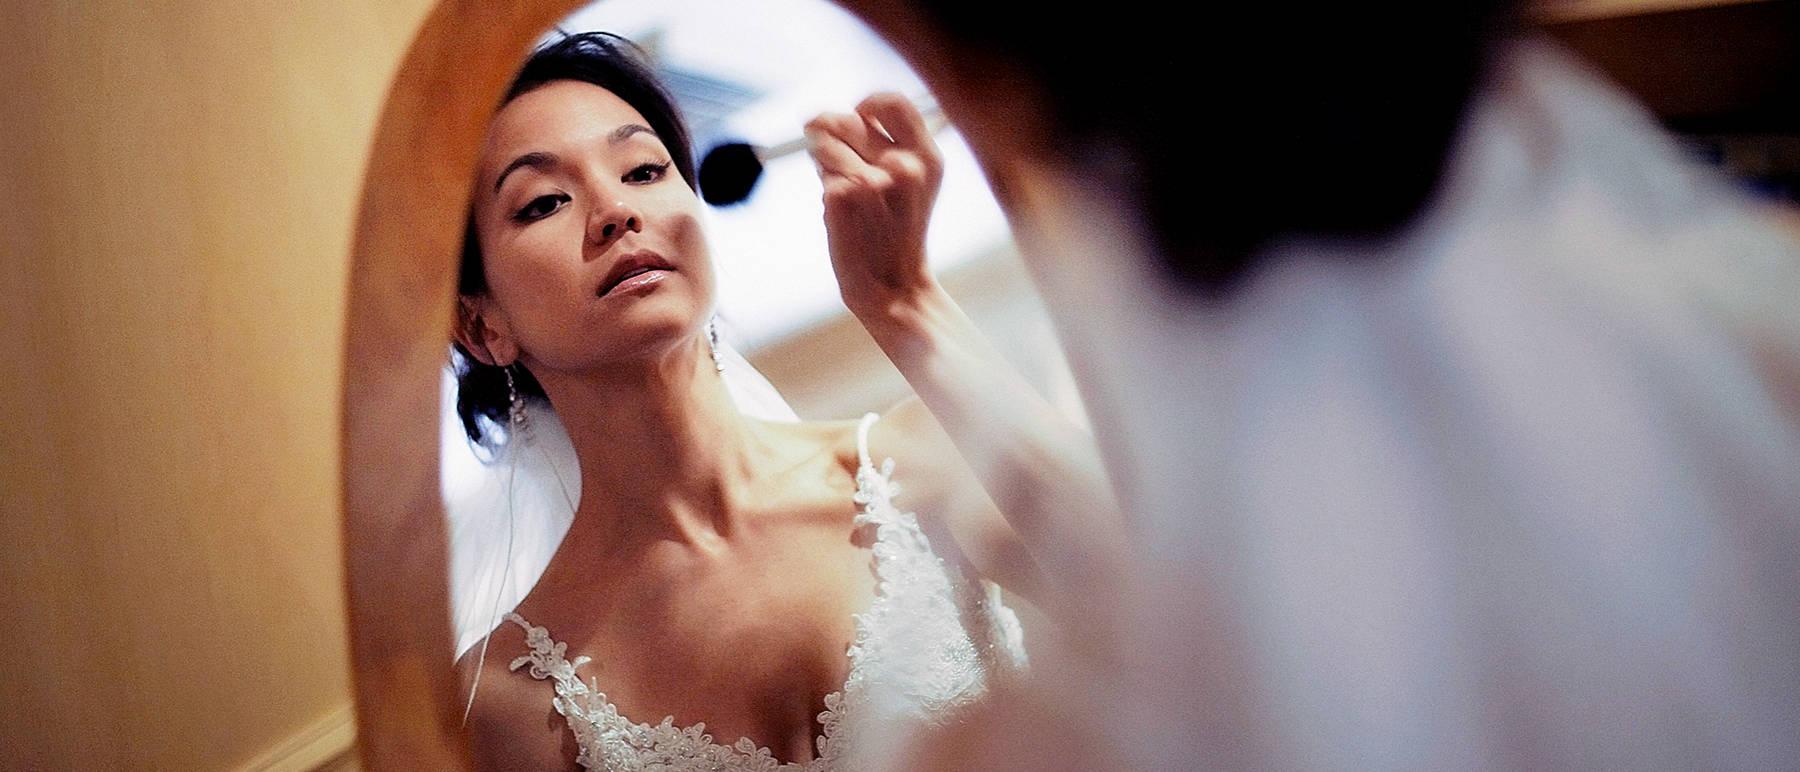 johnandjoseph-wedding-photographer-hz-slider-204